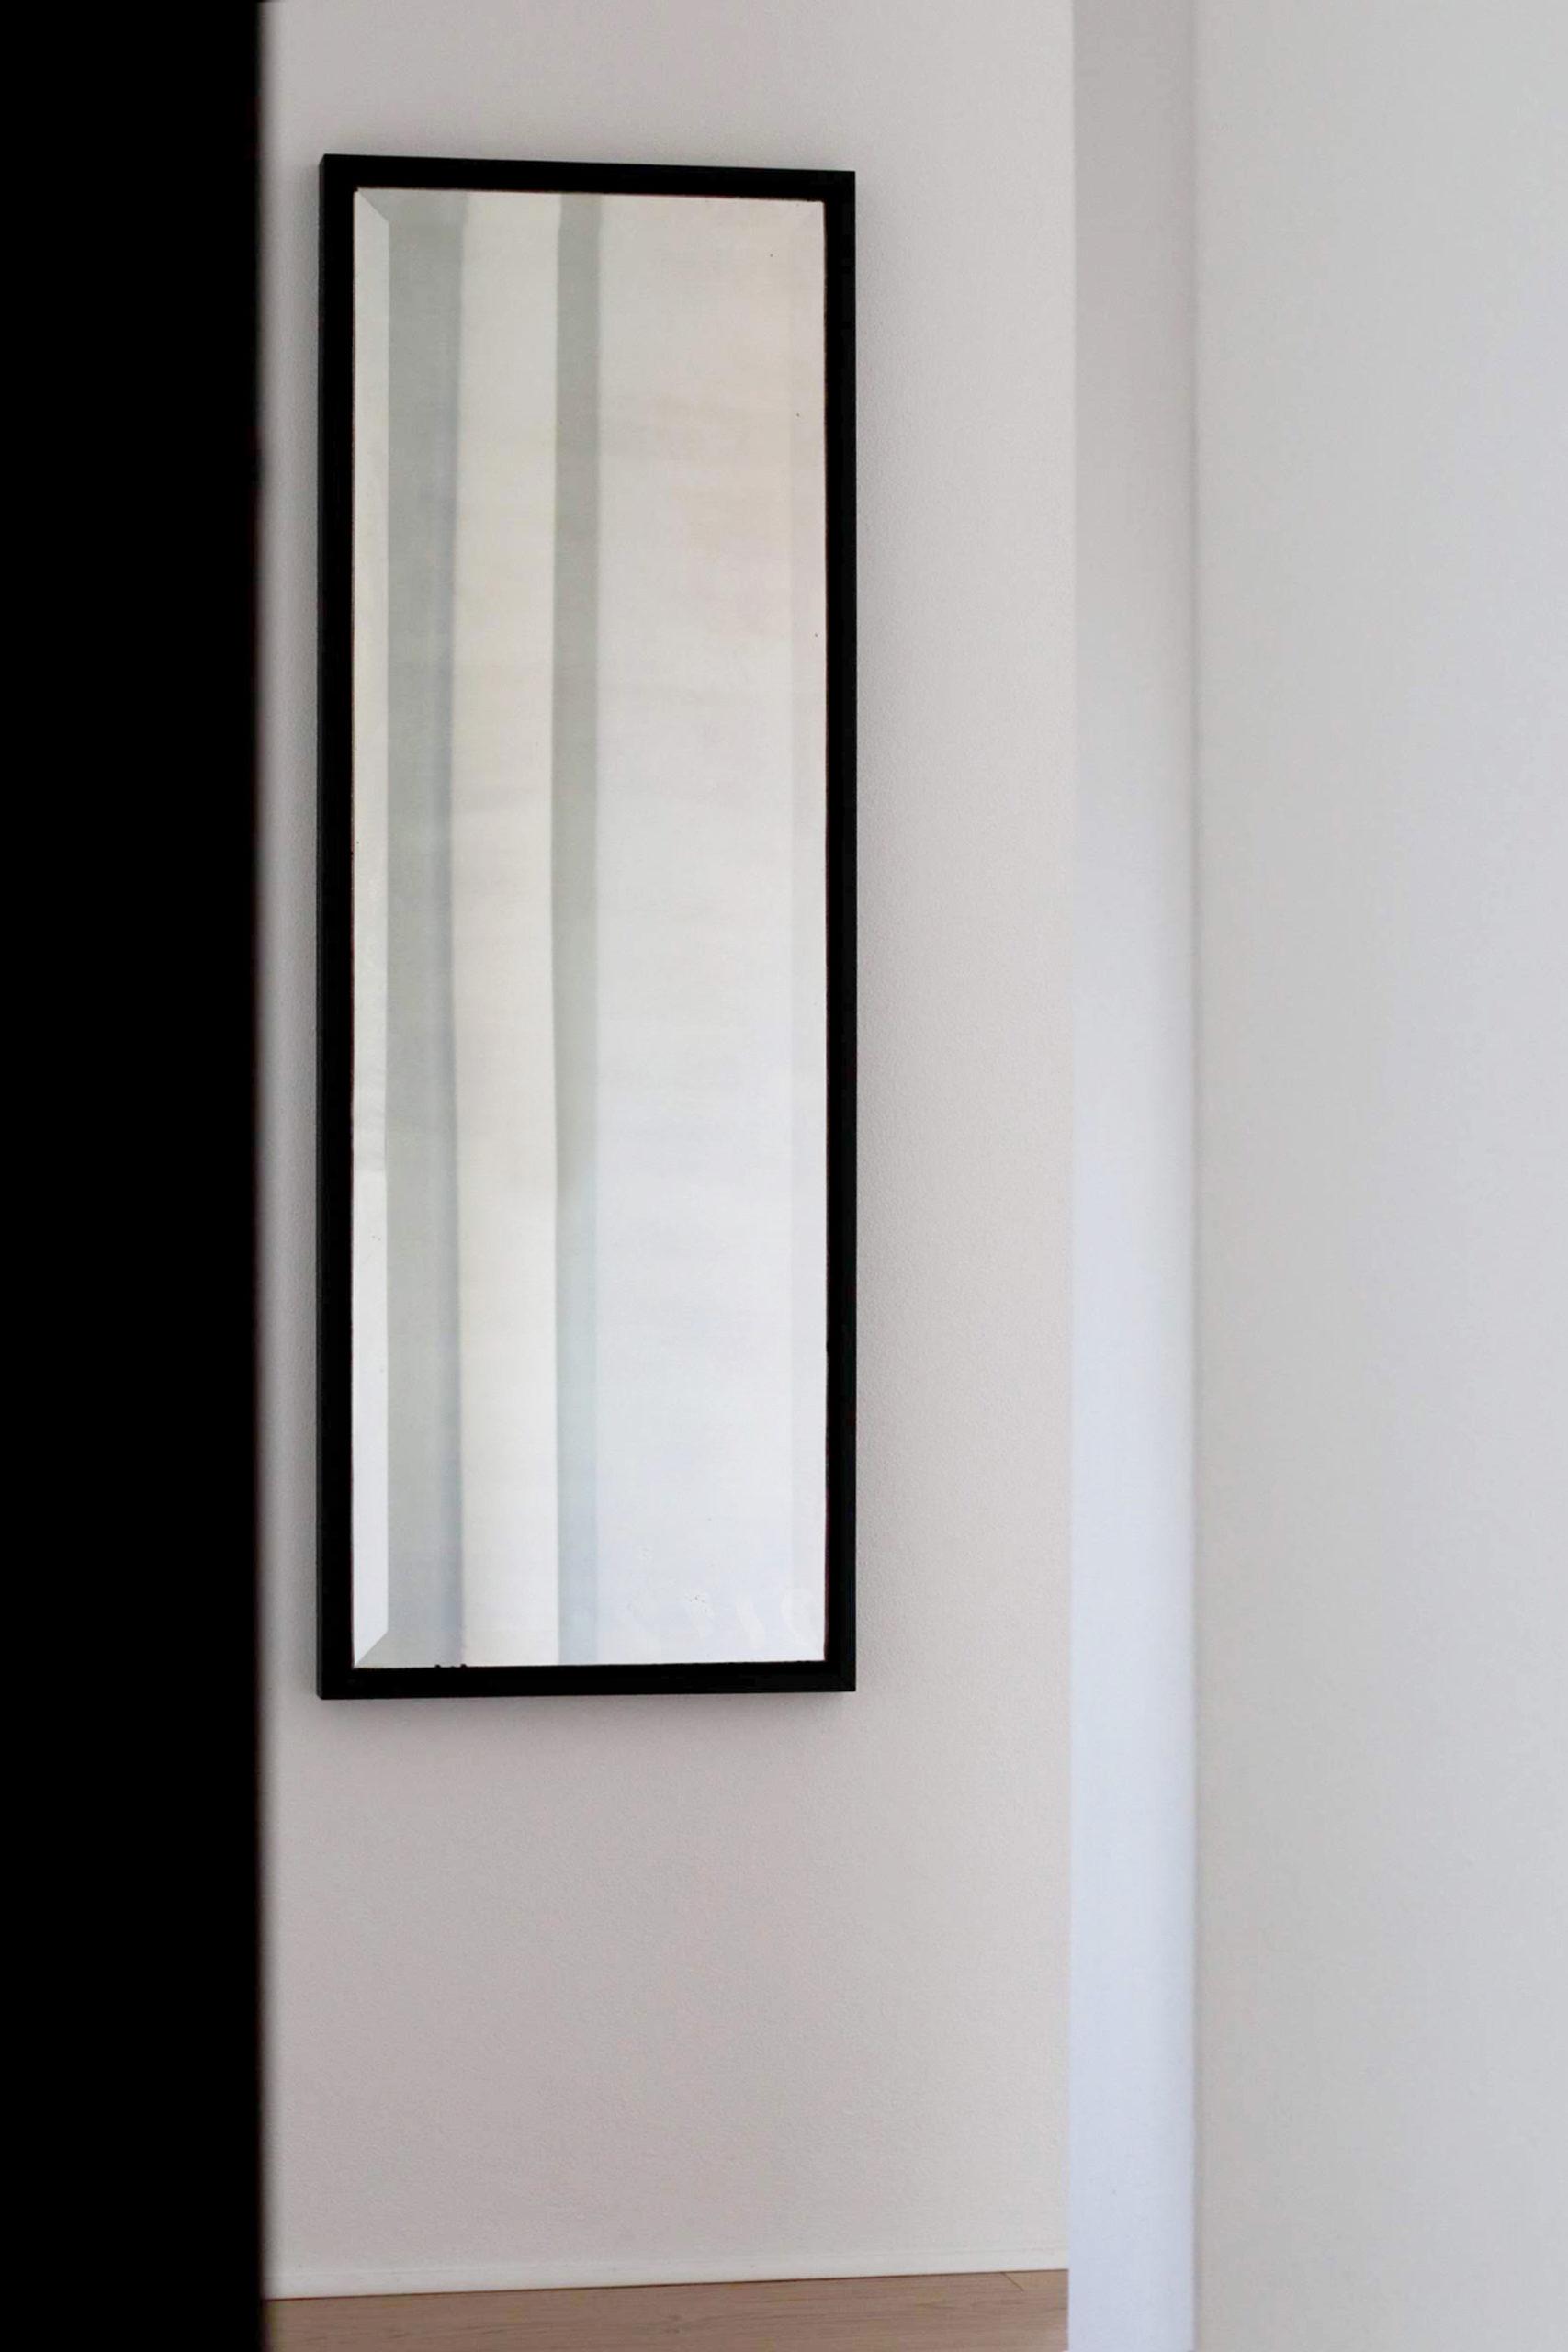 umberto_mauri_architetto_mauri_studio_lago_pusiano_como_bosisio_parini_private_renovation_house_residential_2000_09